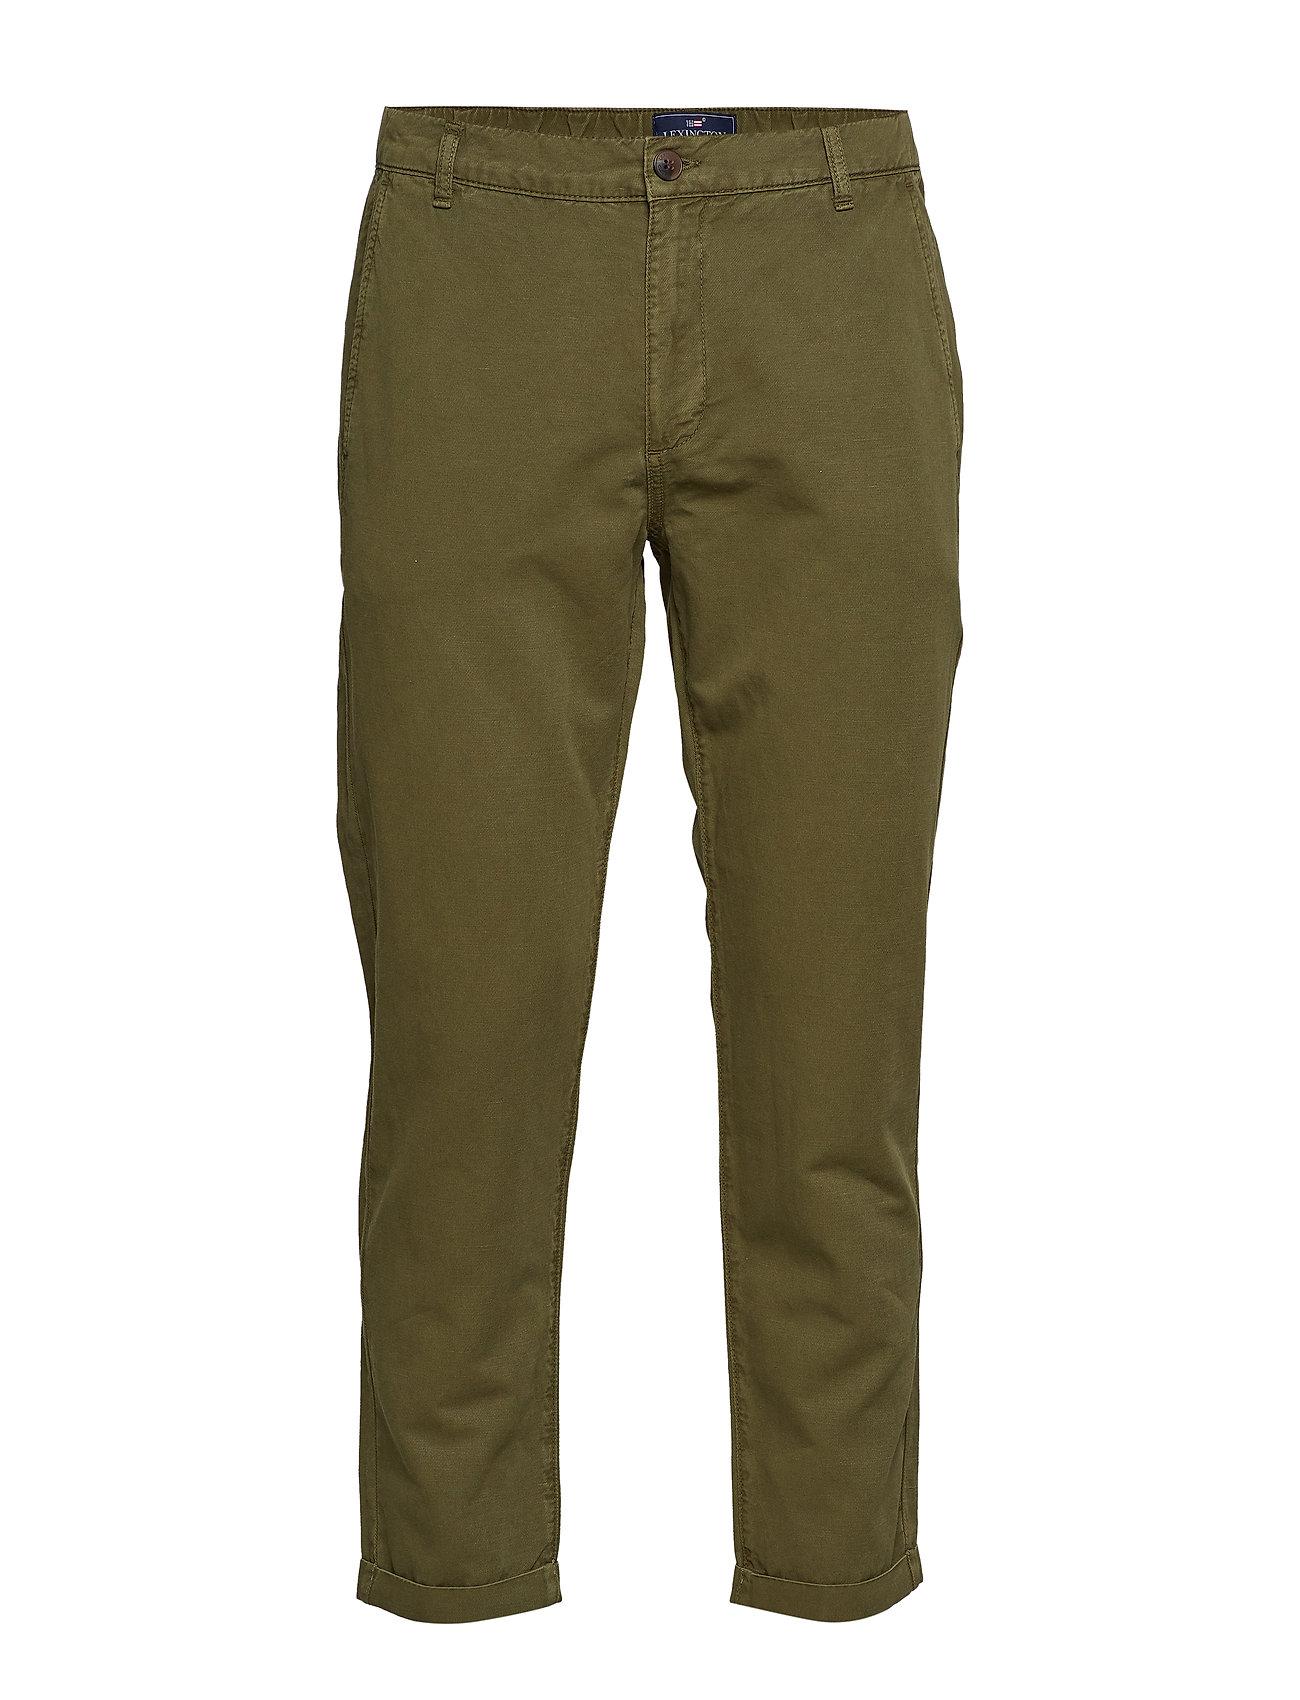 Lexington Clothing Sergio Pants - BEECH GREEN